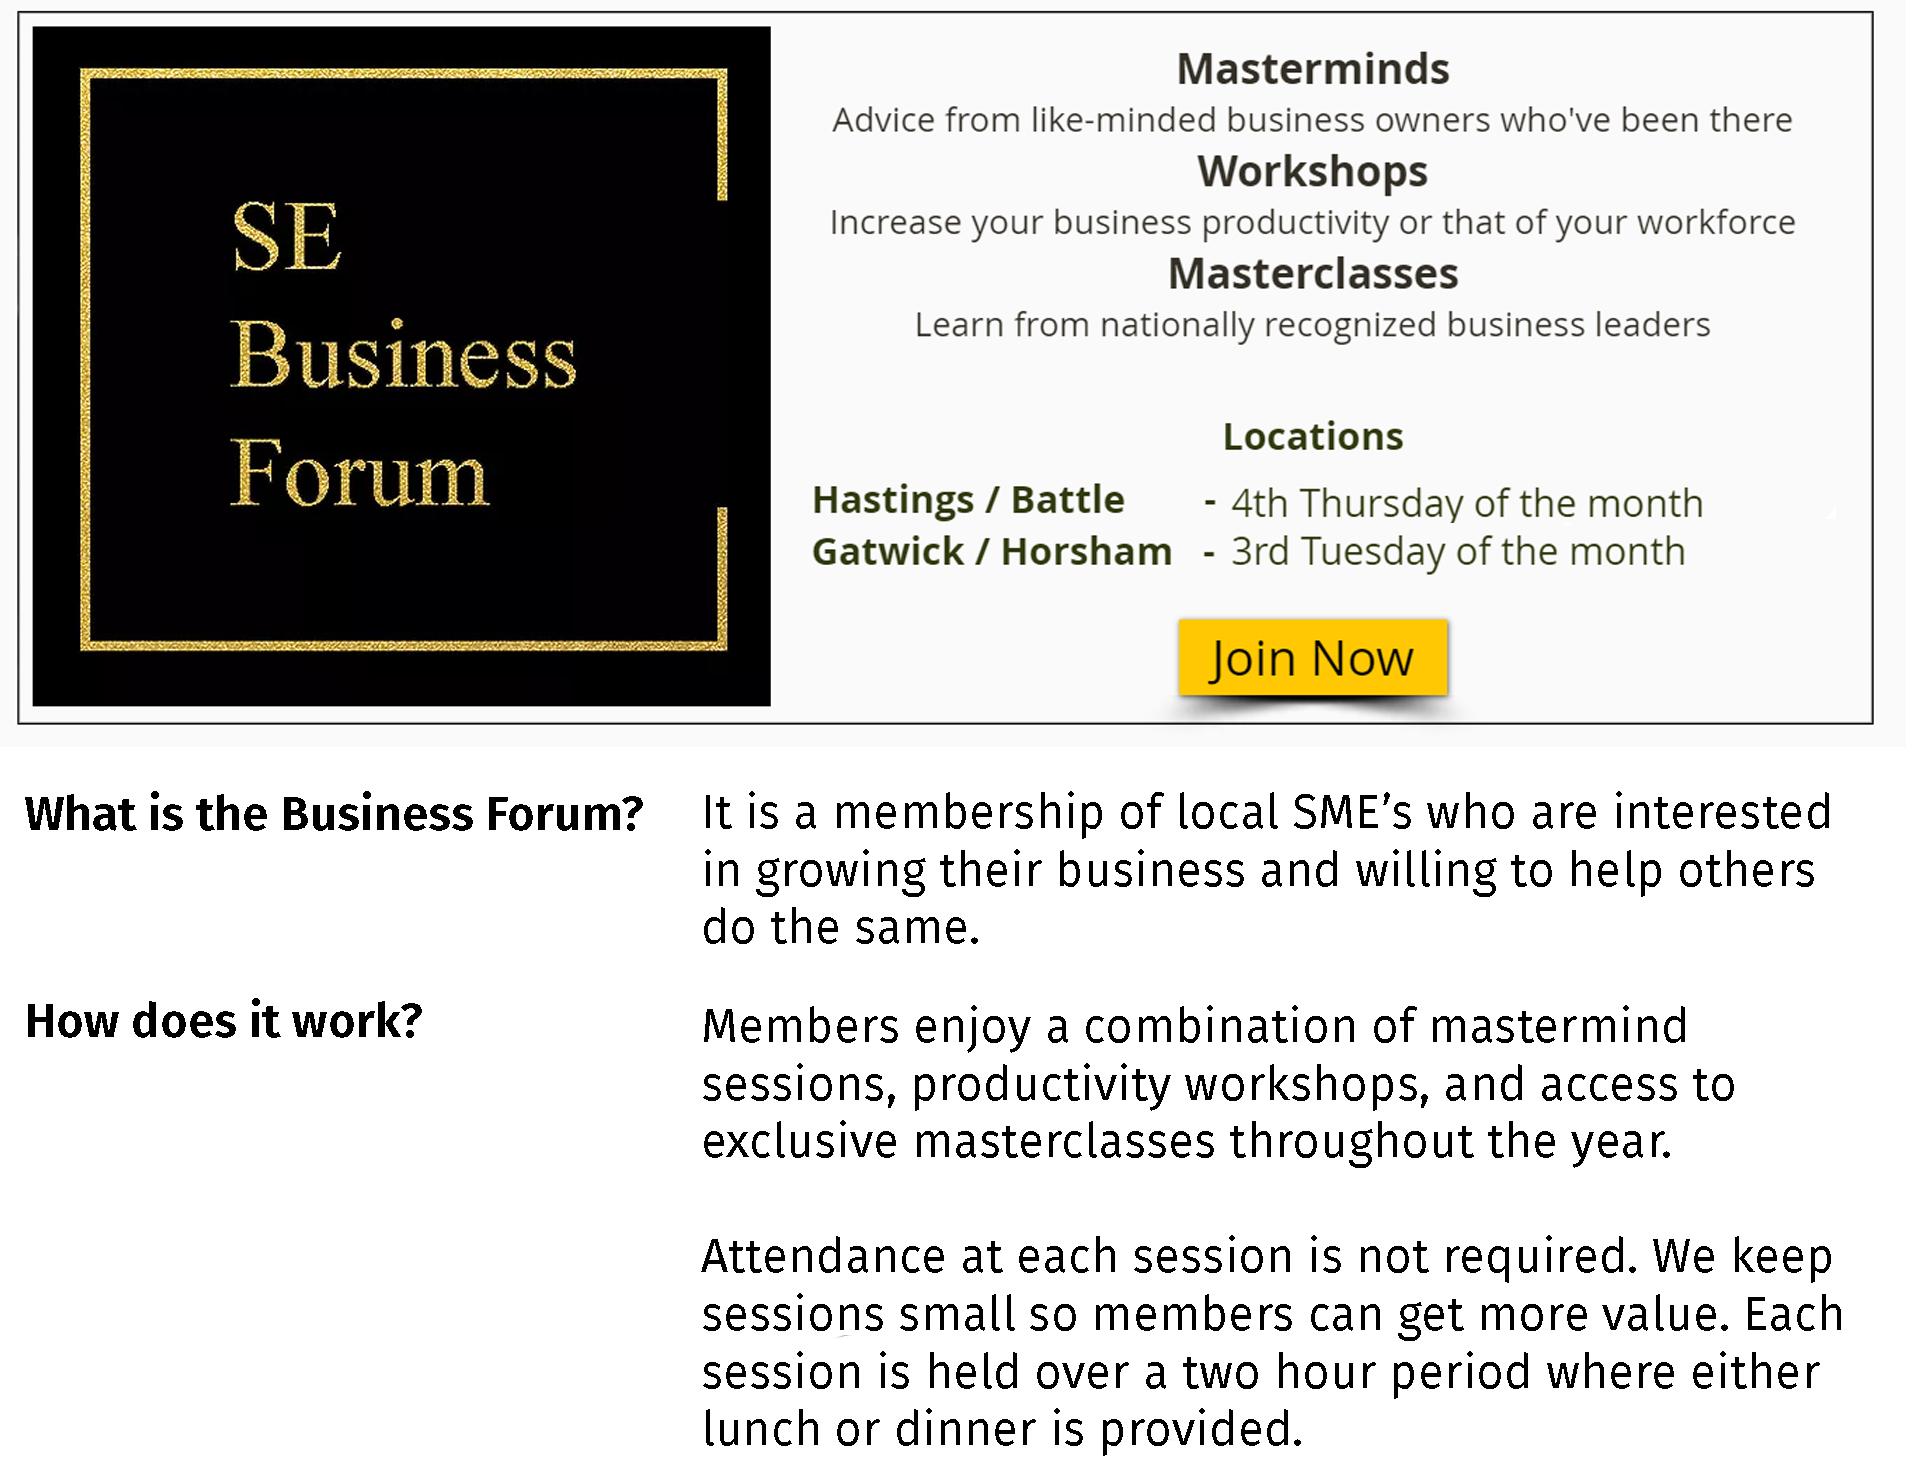 SE Business Forum Mastermind